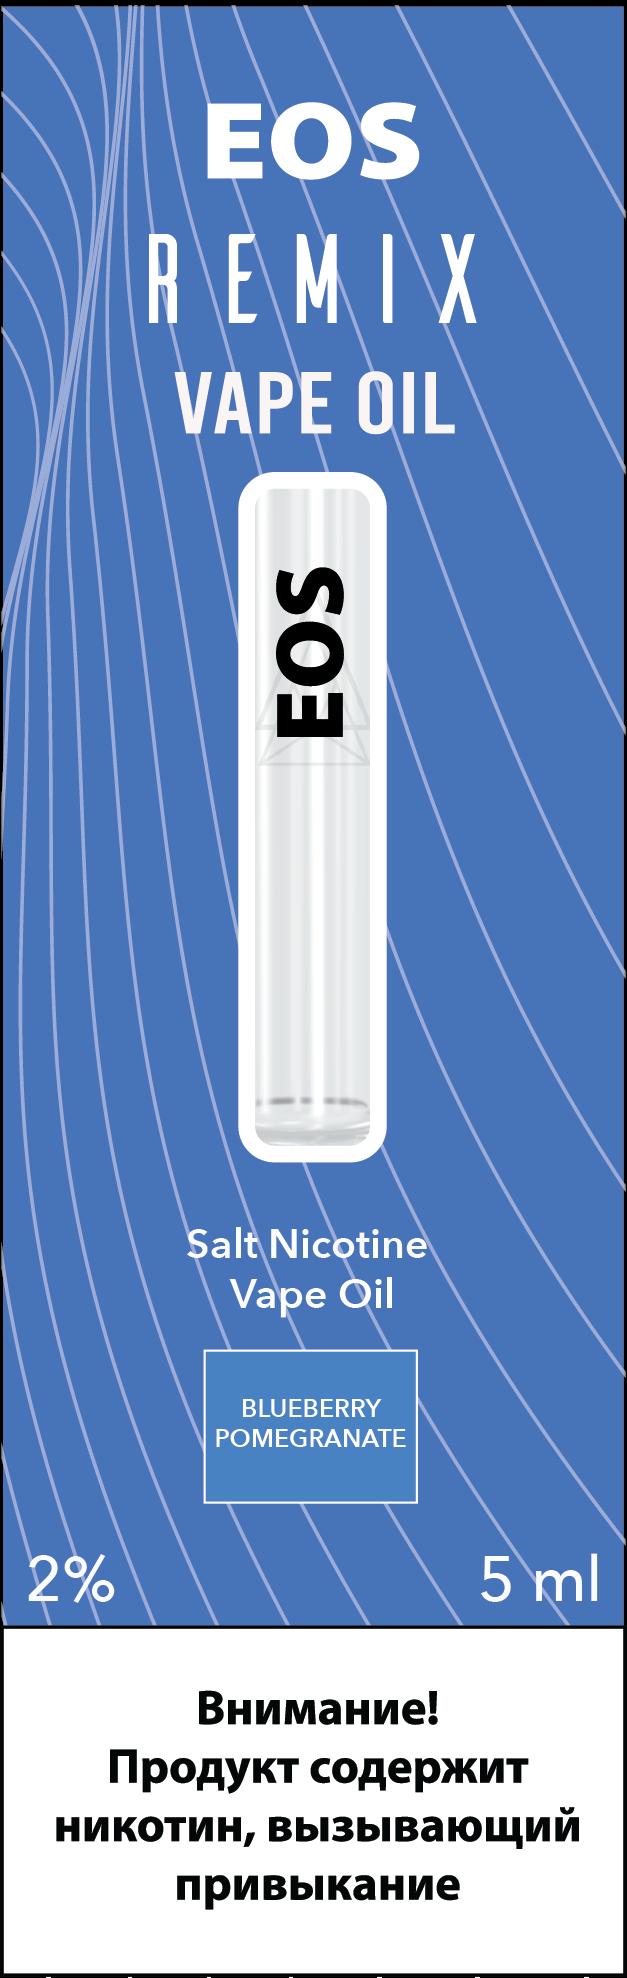 EOS REMIX SALT NIC BLUEBERRY POMERGRANATE 2% 5ml